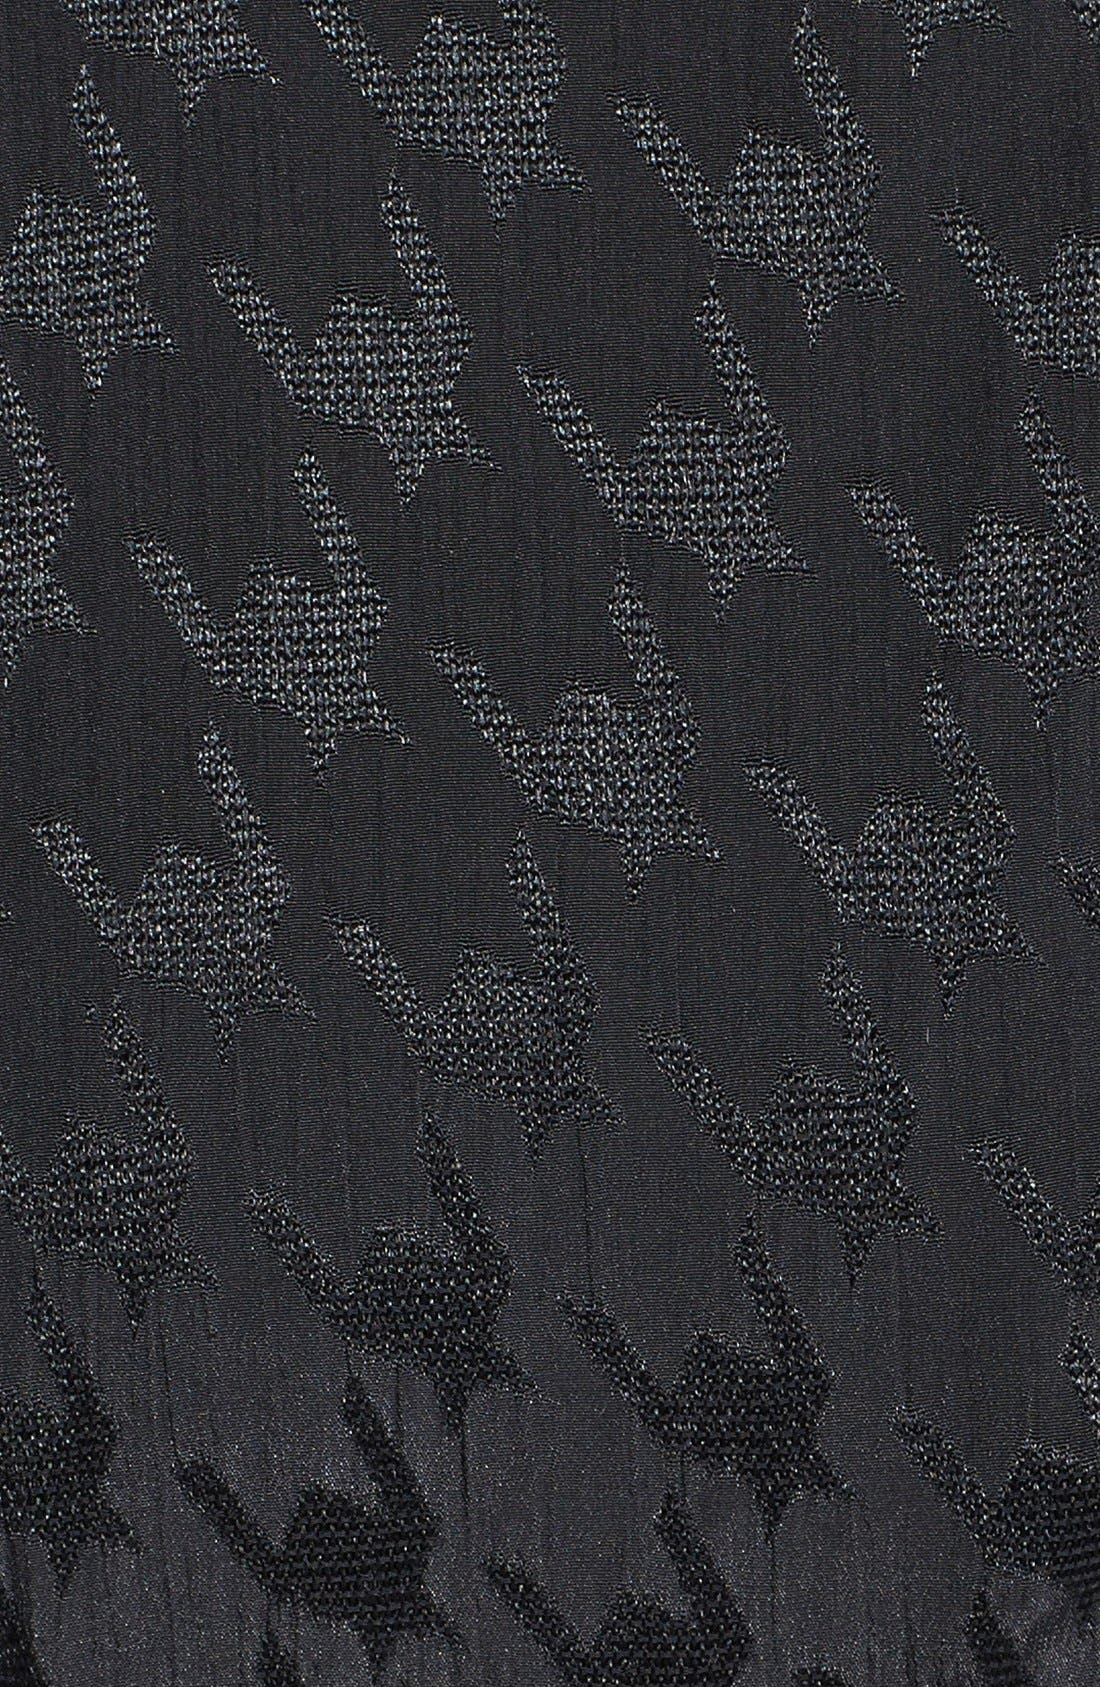 ASTR Jacquard Houndstooth Maxi Dress,                             Alternate thumbnail 2, color,                             001